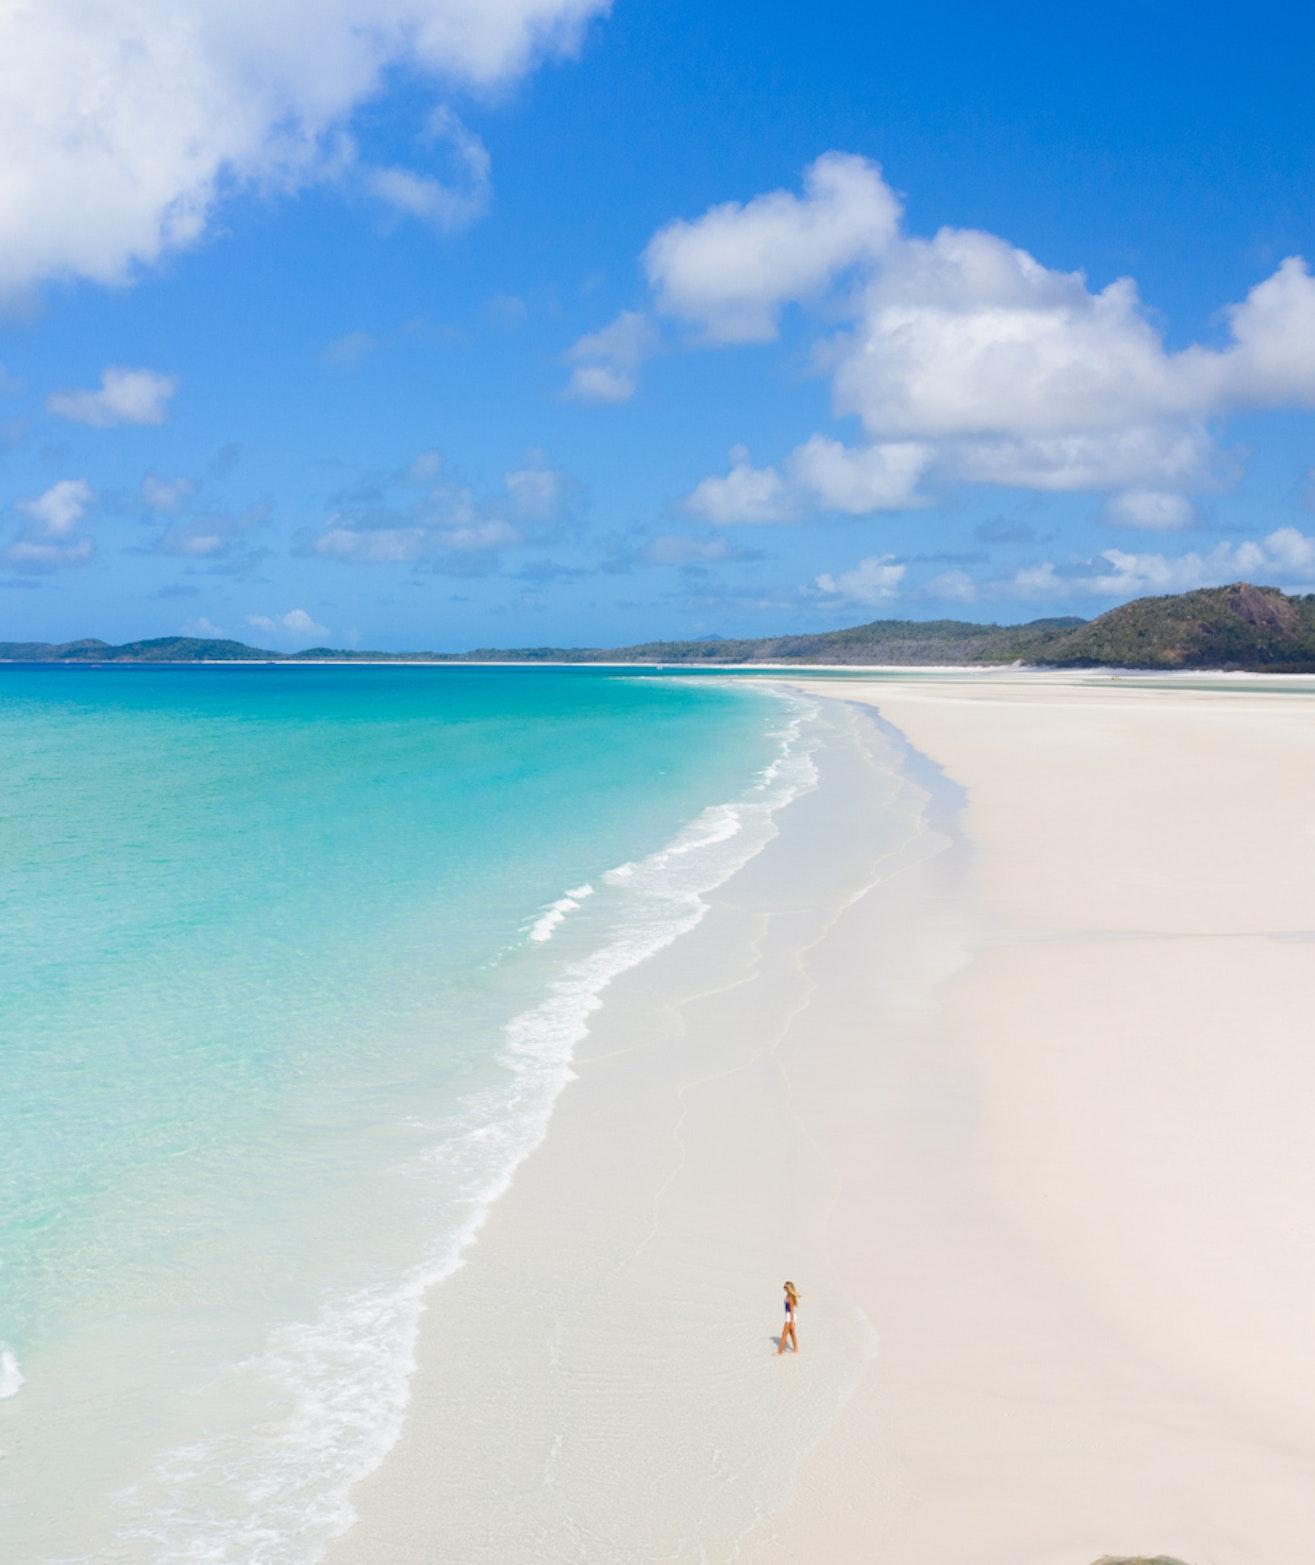 Daily Weather Report - Cruise Whitsundays